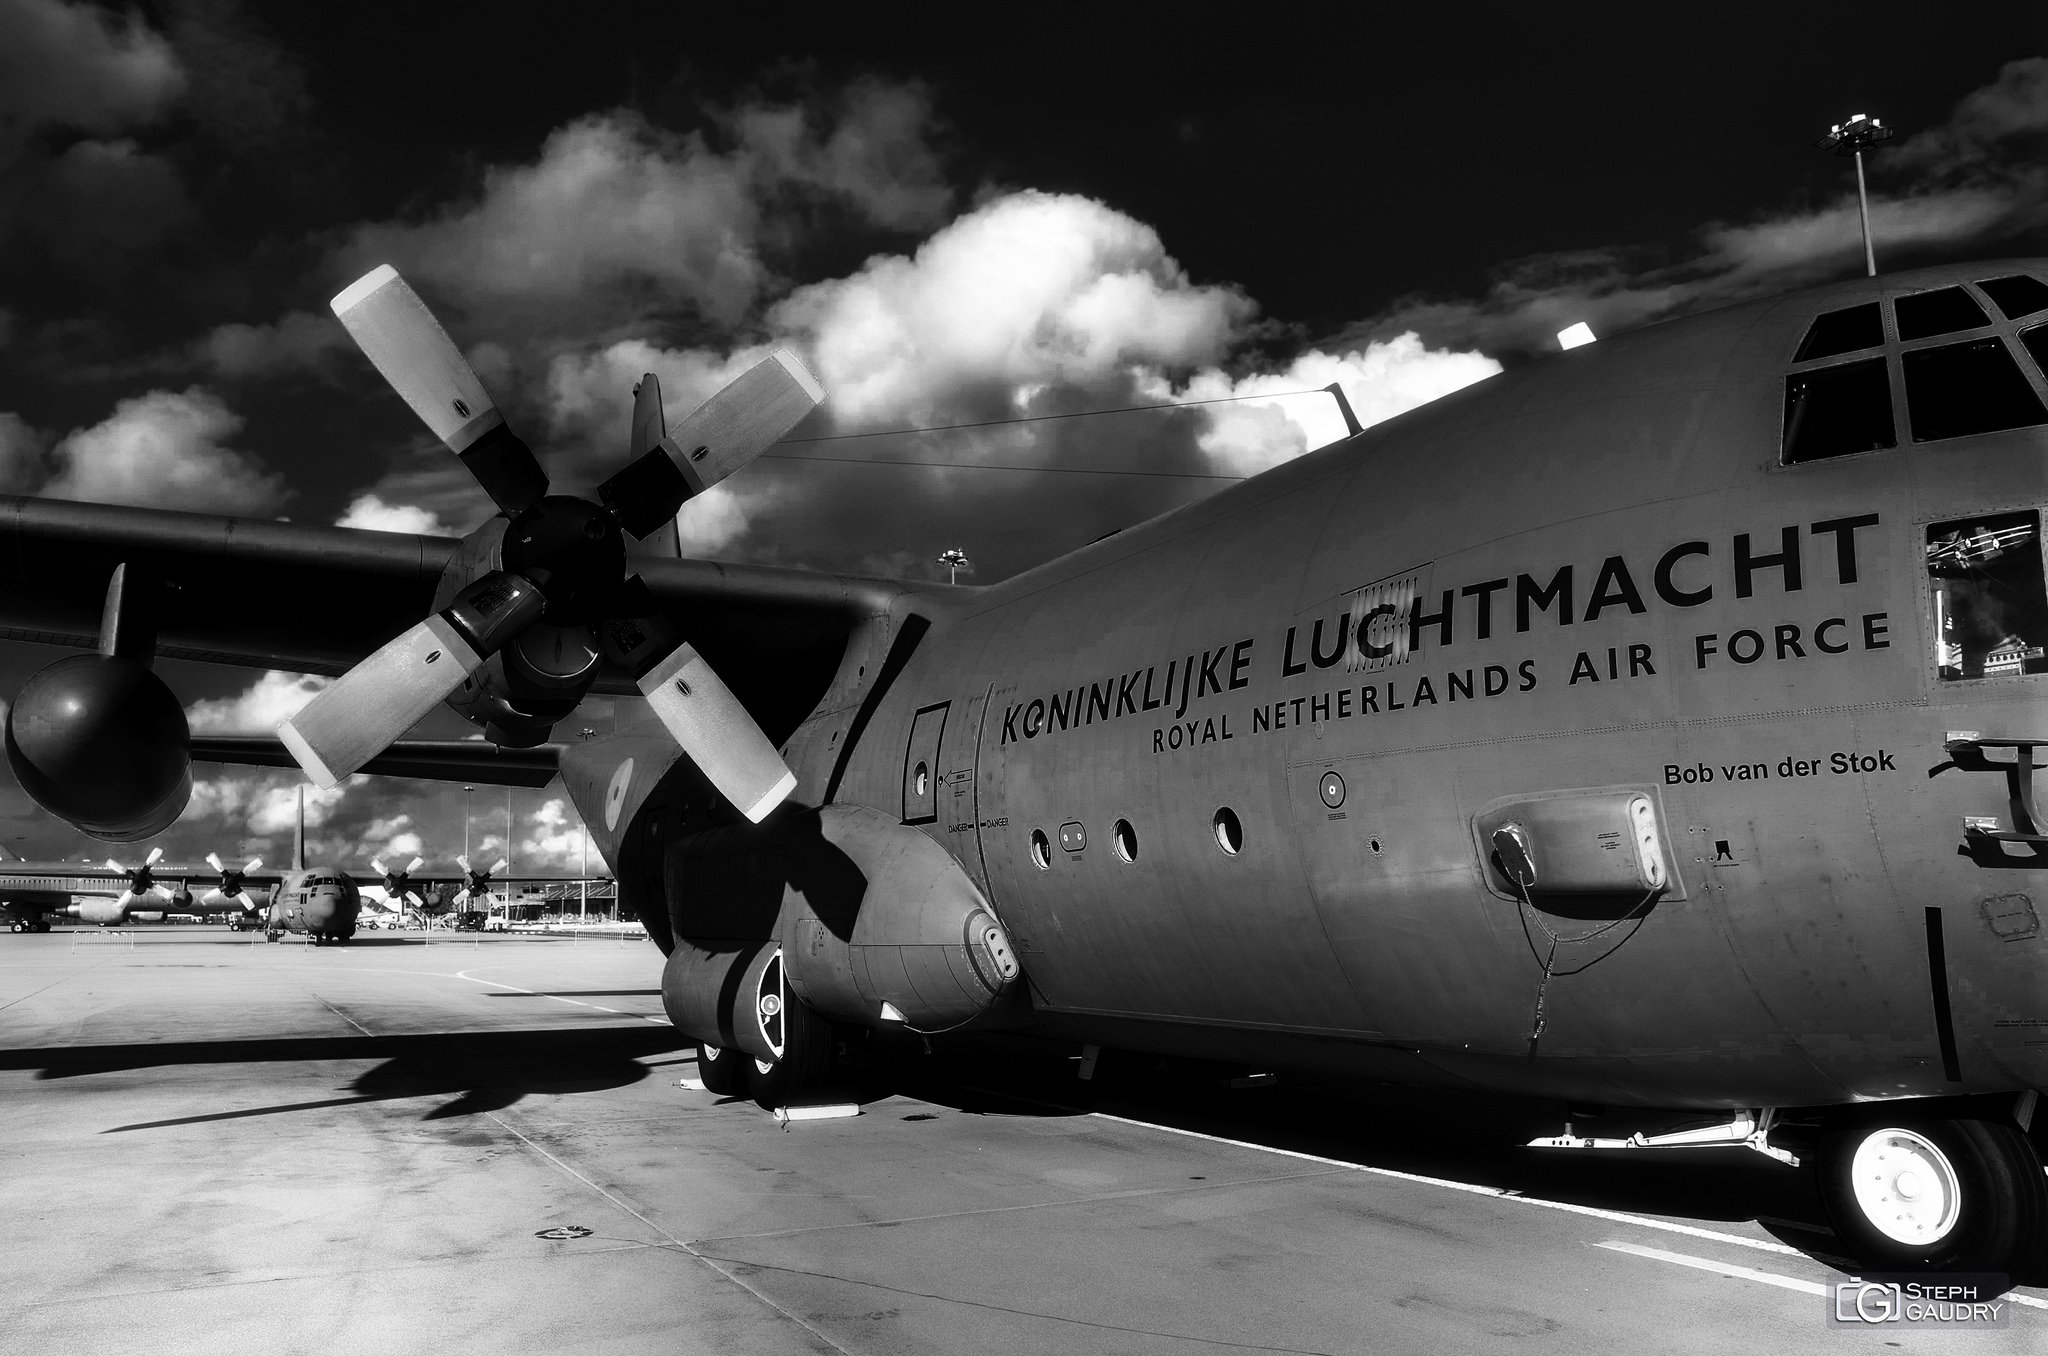 Royal Netherlands Air Force: Lockheed C-130H-30 Hercules